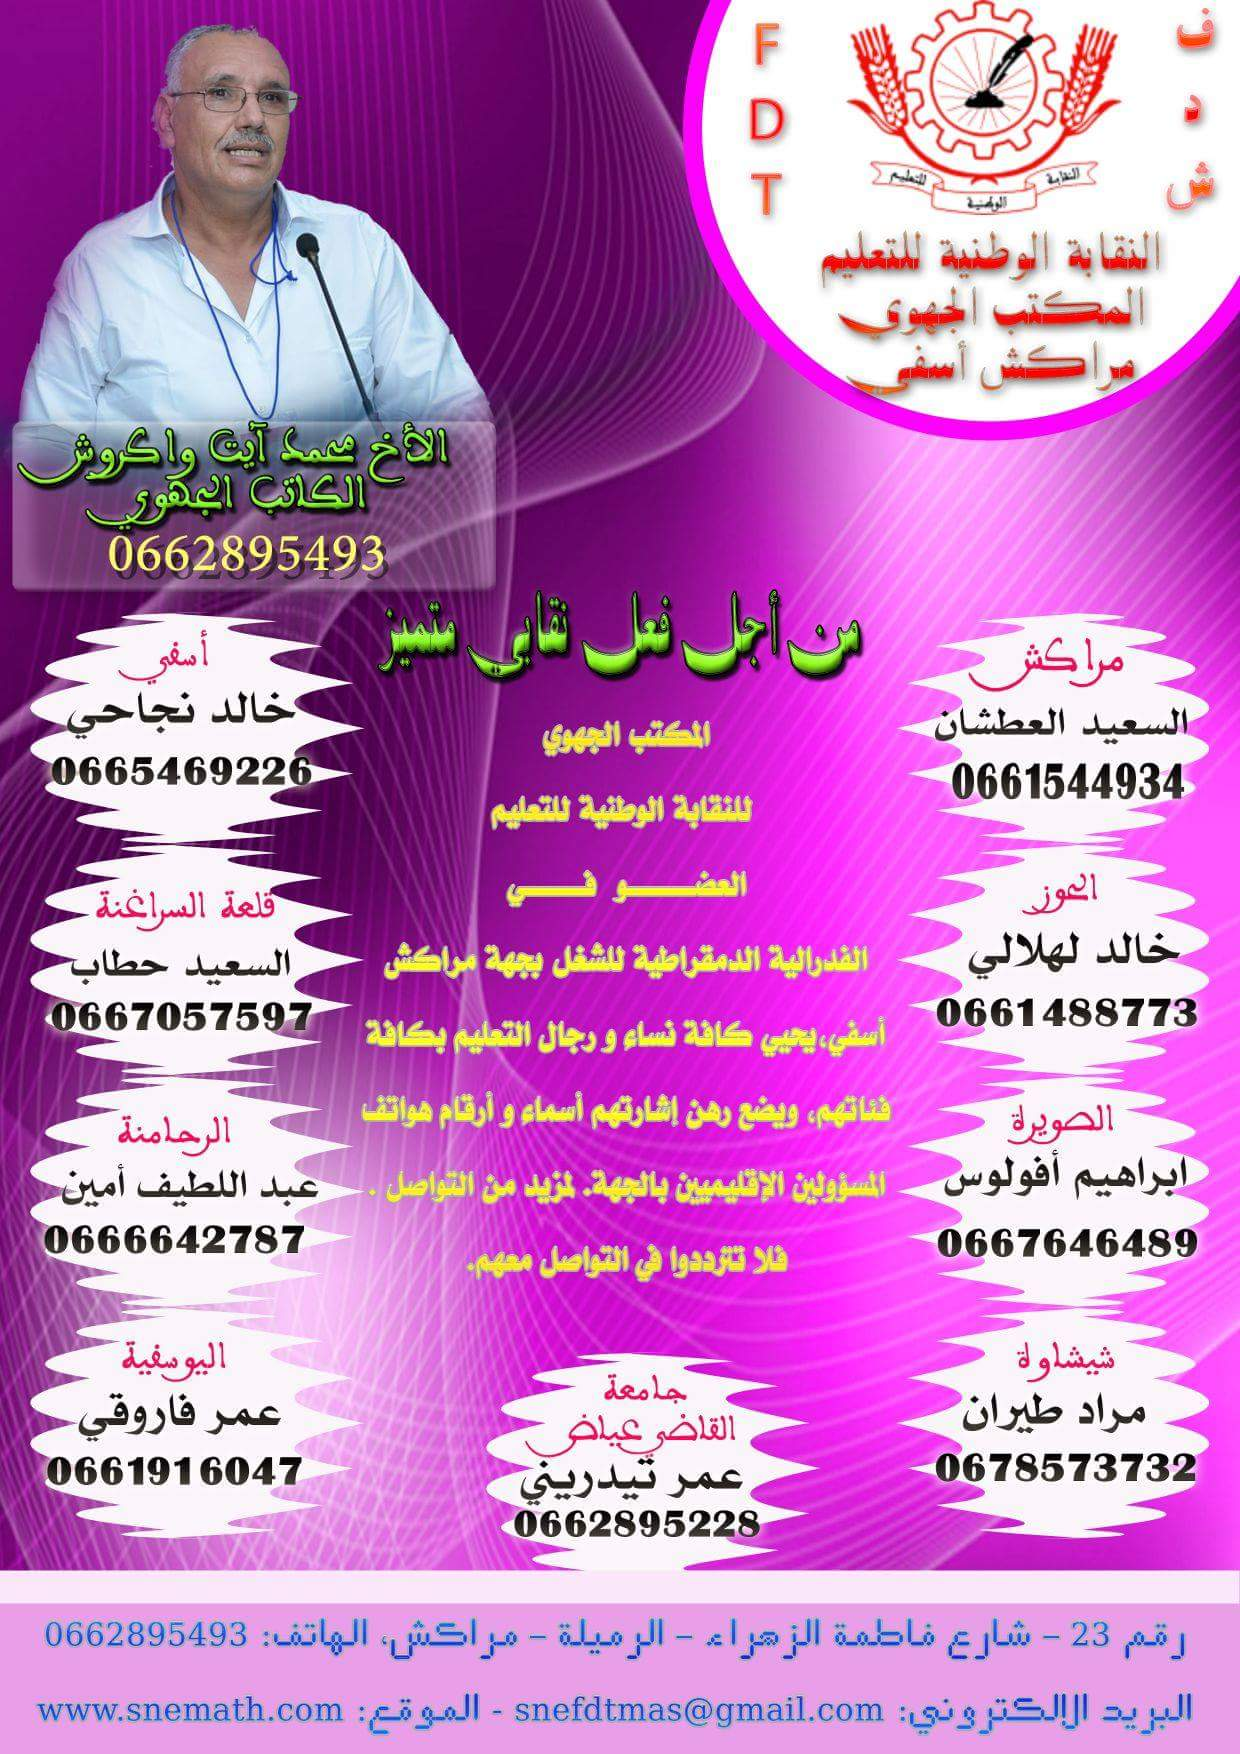 received_10208922302762436.jpeg